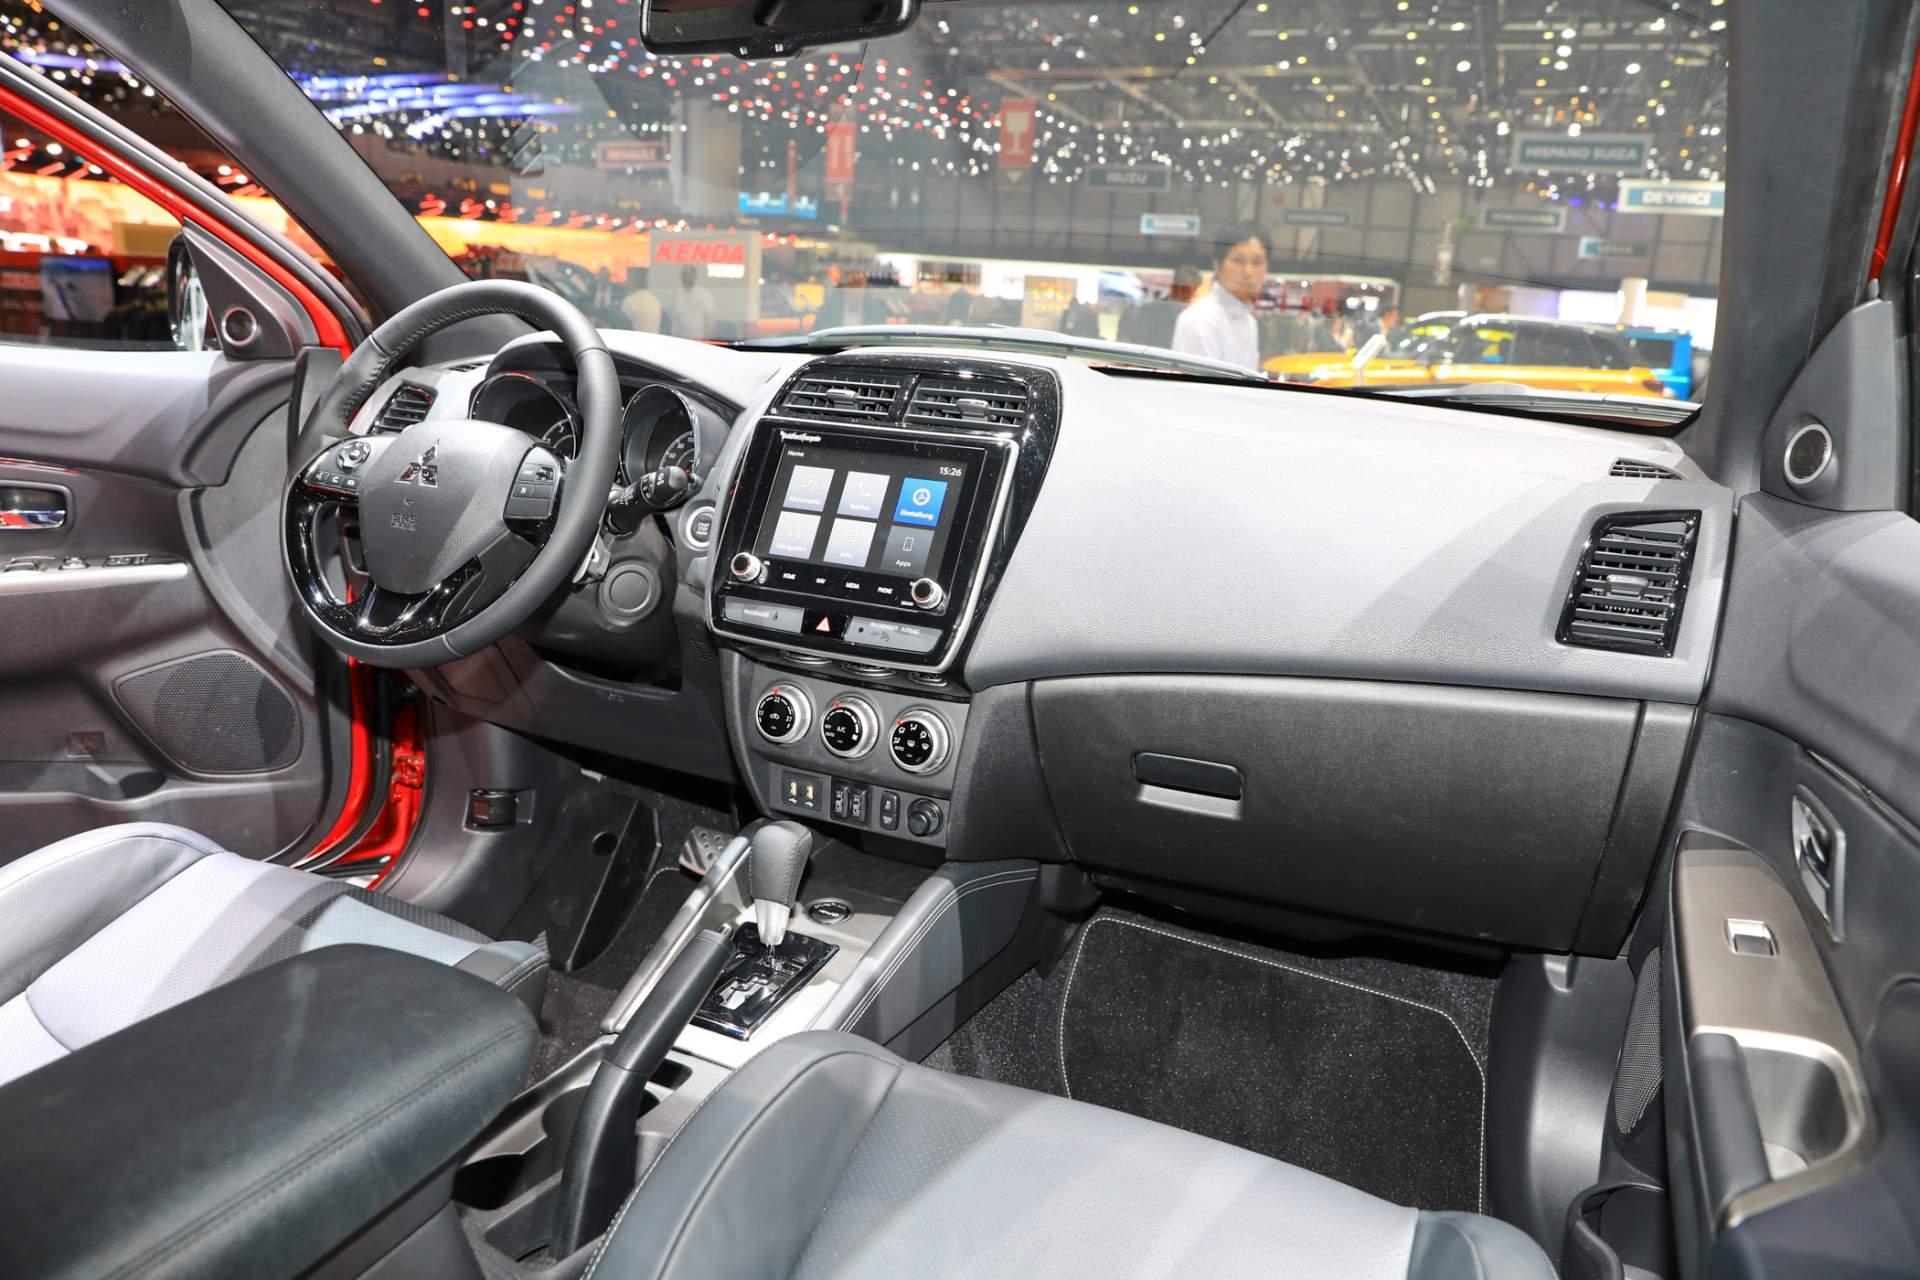 фото салона Mitsubishi ASX 2021 года